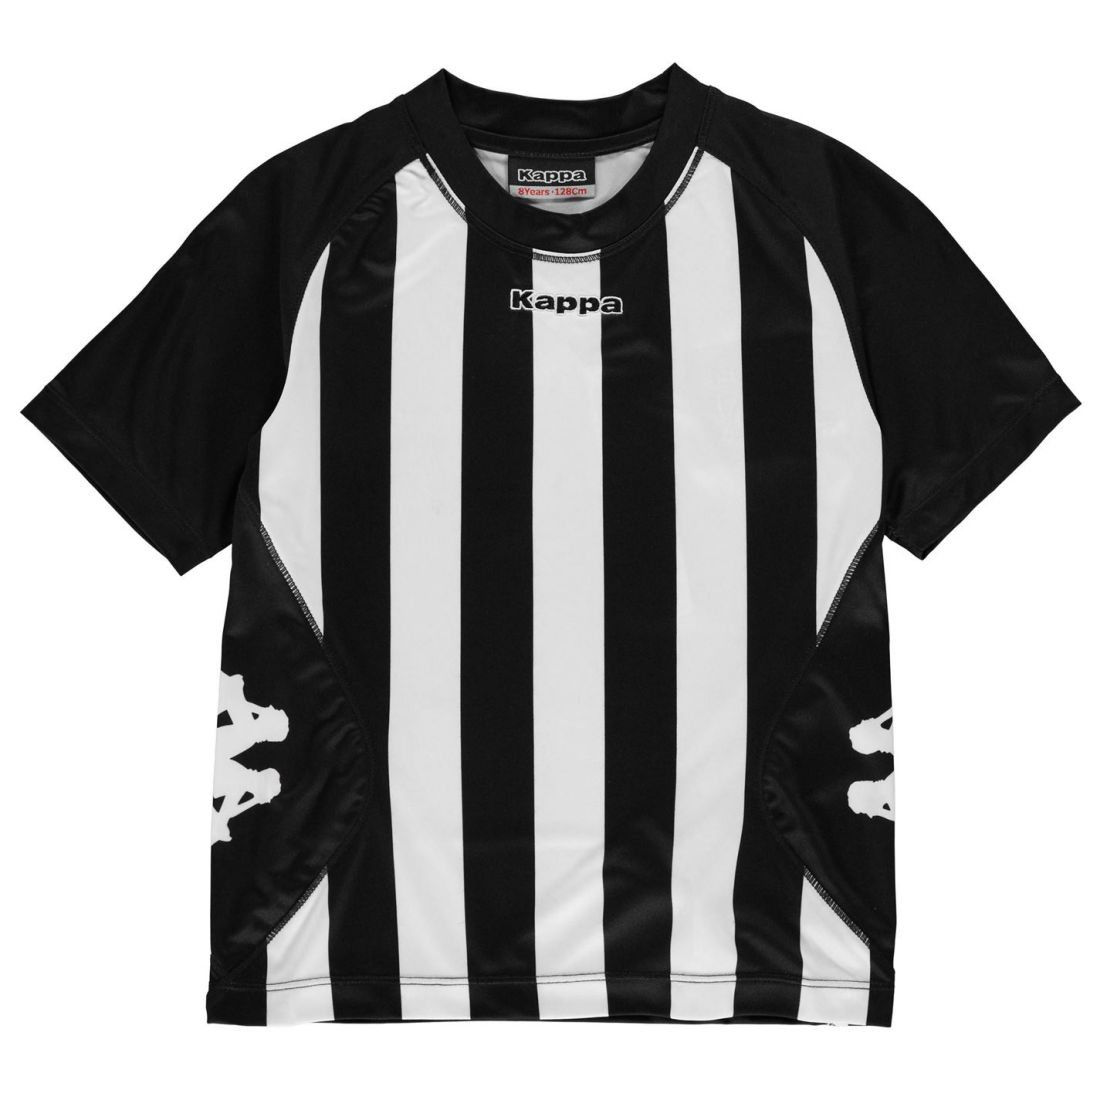 e6b51b14c186 Details about Kappa Kids Boys Barletta Short Sleeve T Shirt Junior  Performance Tee Top Crew